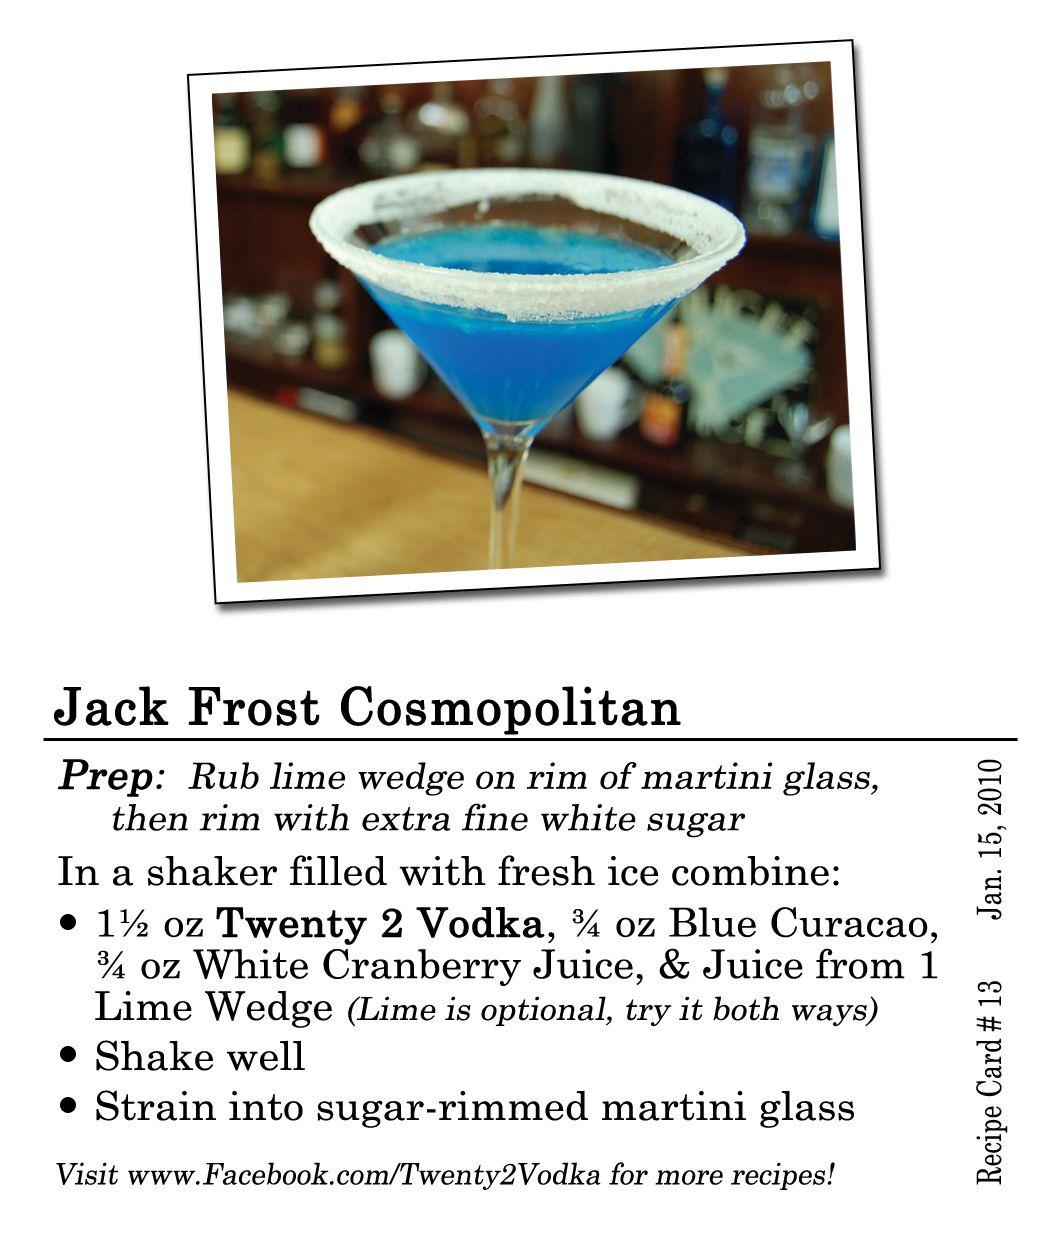 #Vodka, Blue Curacao, White